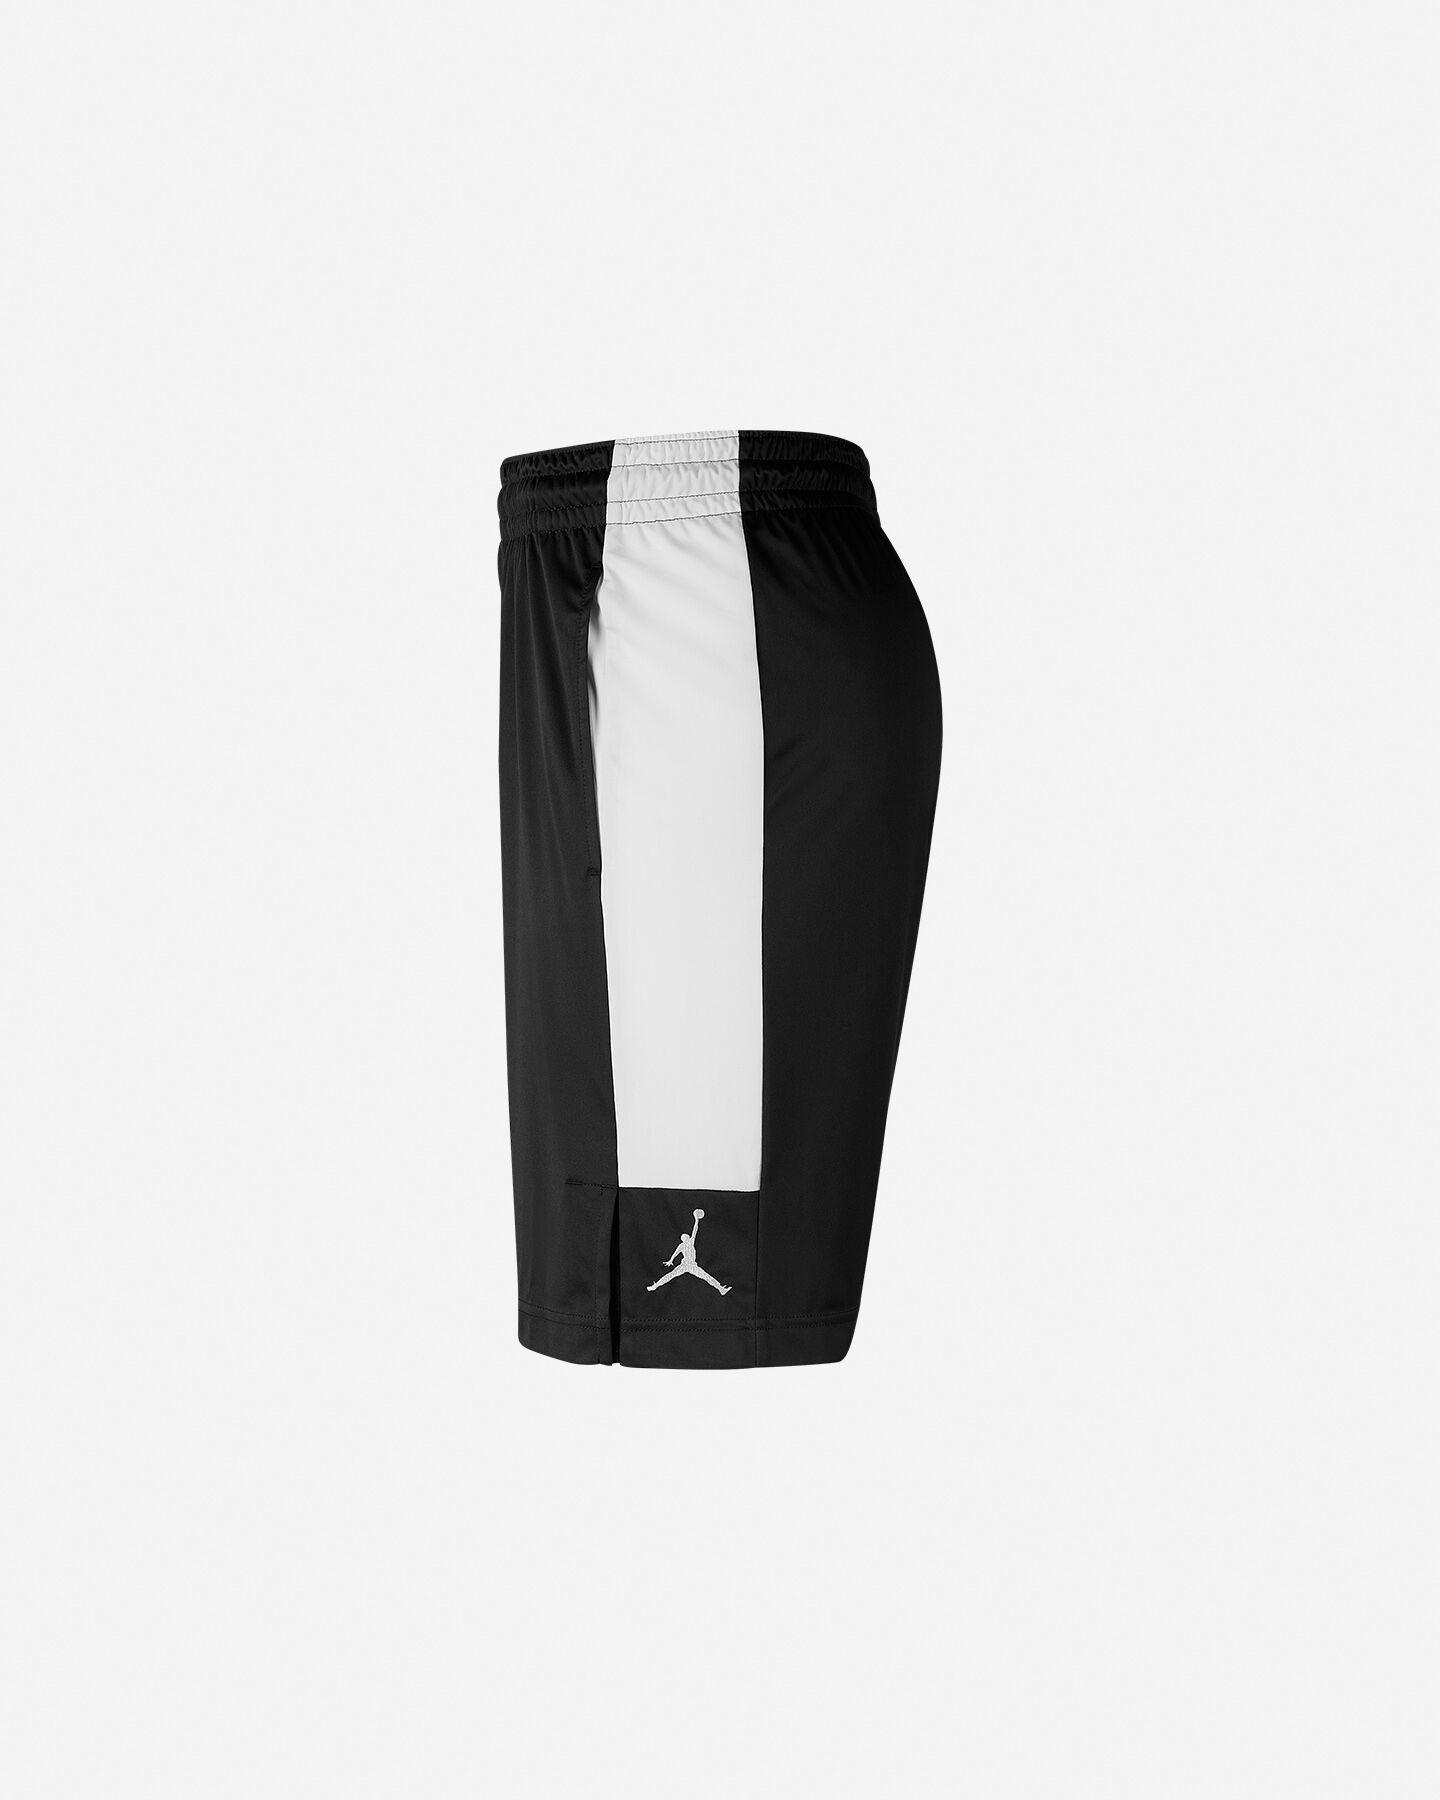 Pantaloncini basket NIKE JORDAN DRI-FIT 23 ALPHA M S5224675 scatto 1